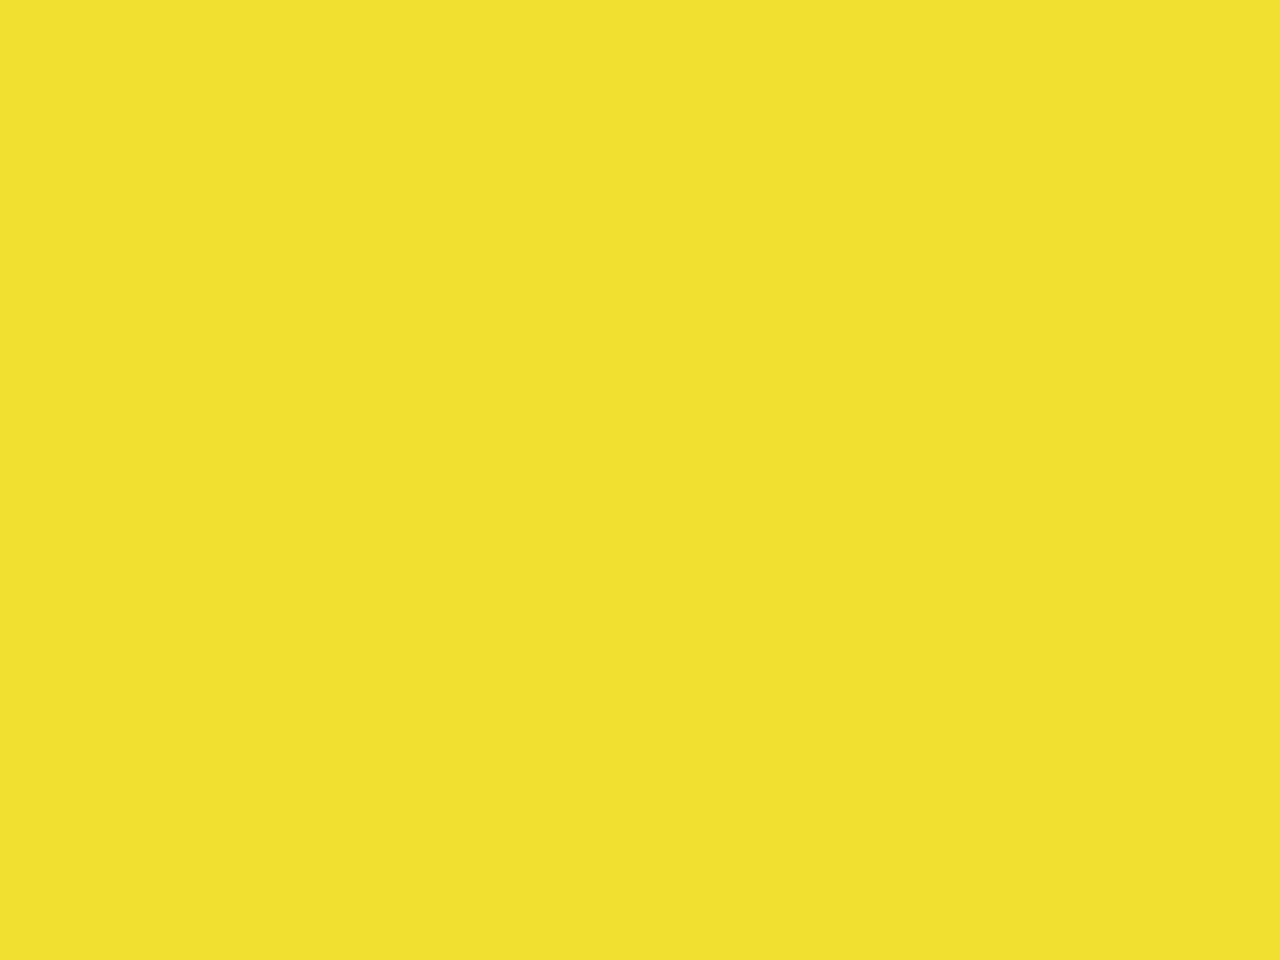 1280x960 Dandelion Solid Color Background